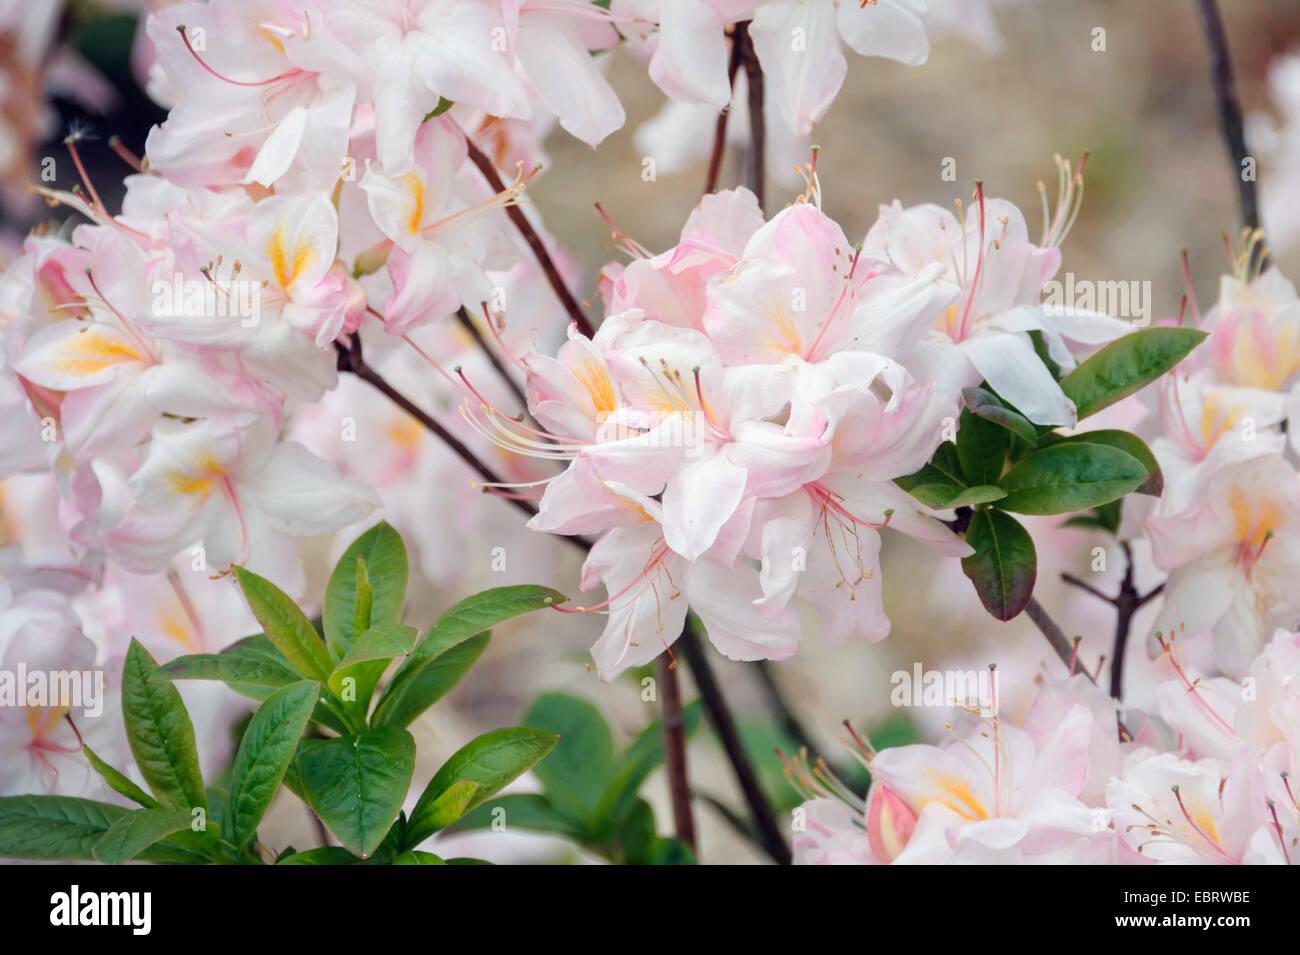 Japanese Azalea (Rhododendron 'Satomi', Rhododendron Satomi), cultivar Satomi - Stock Image